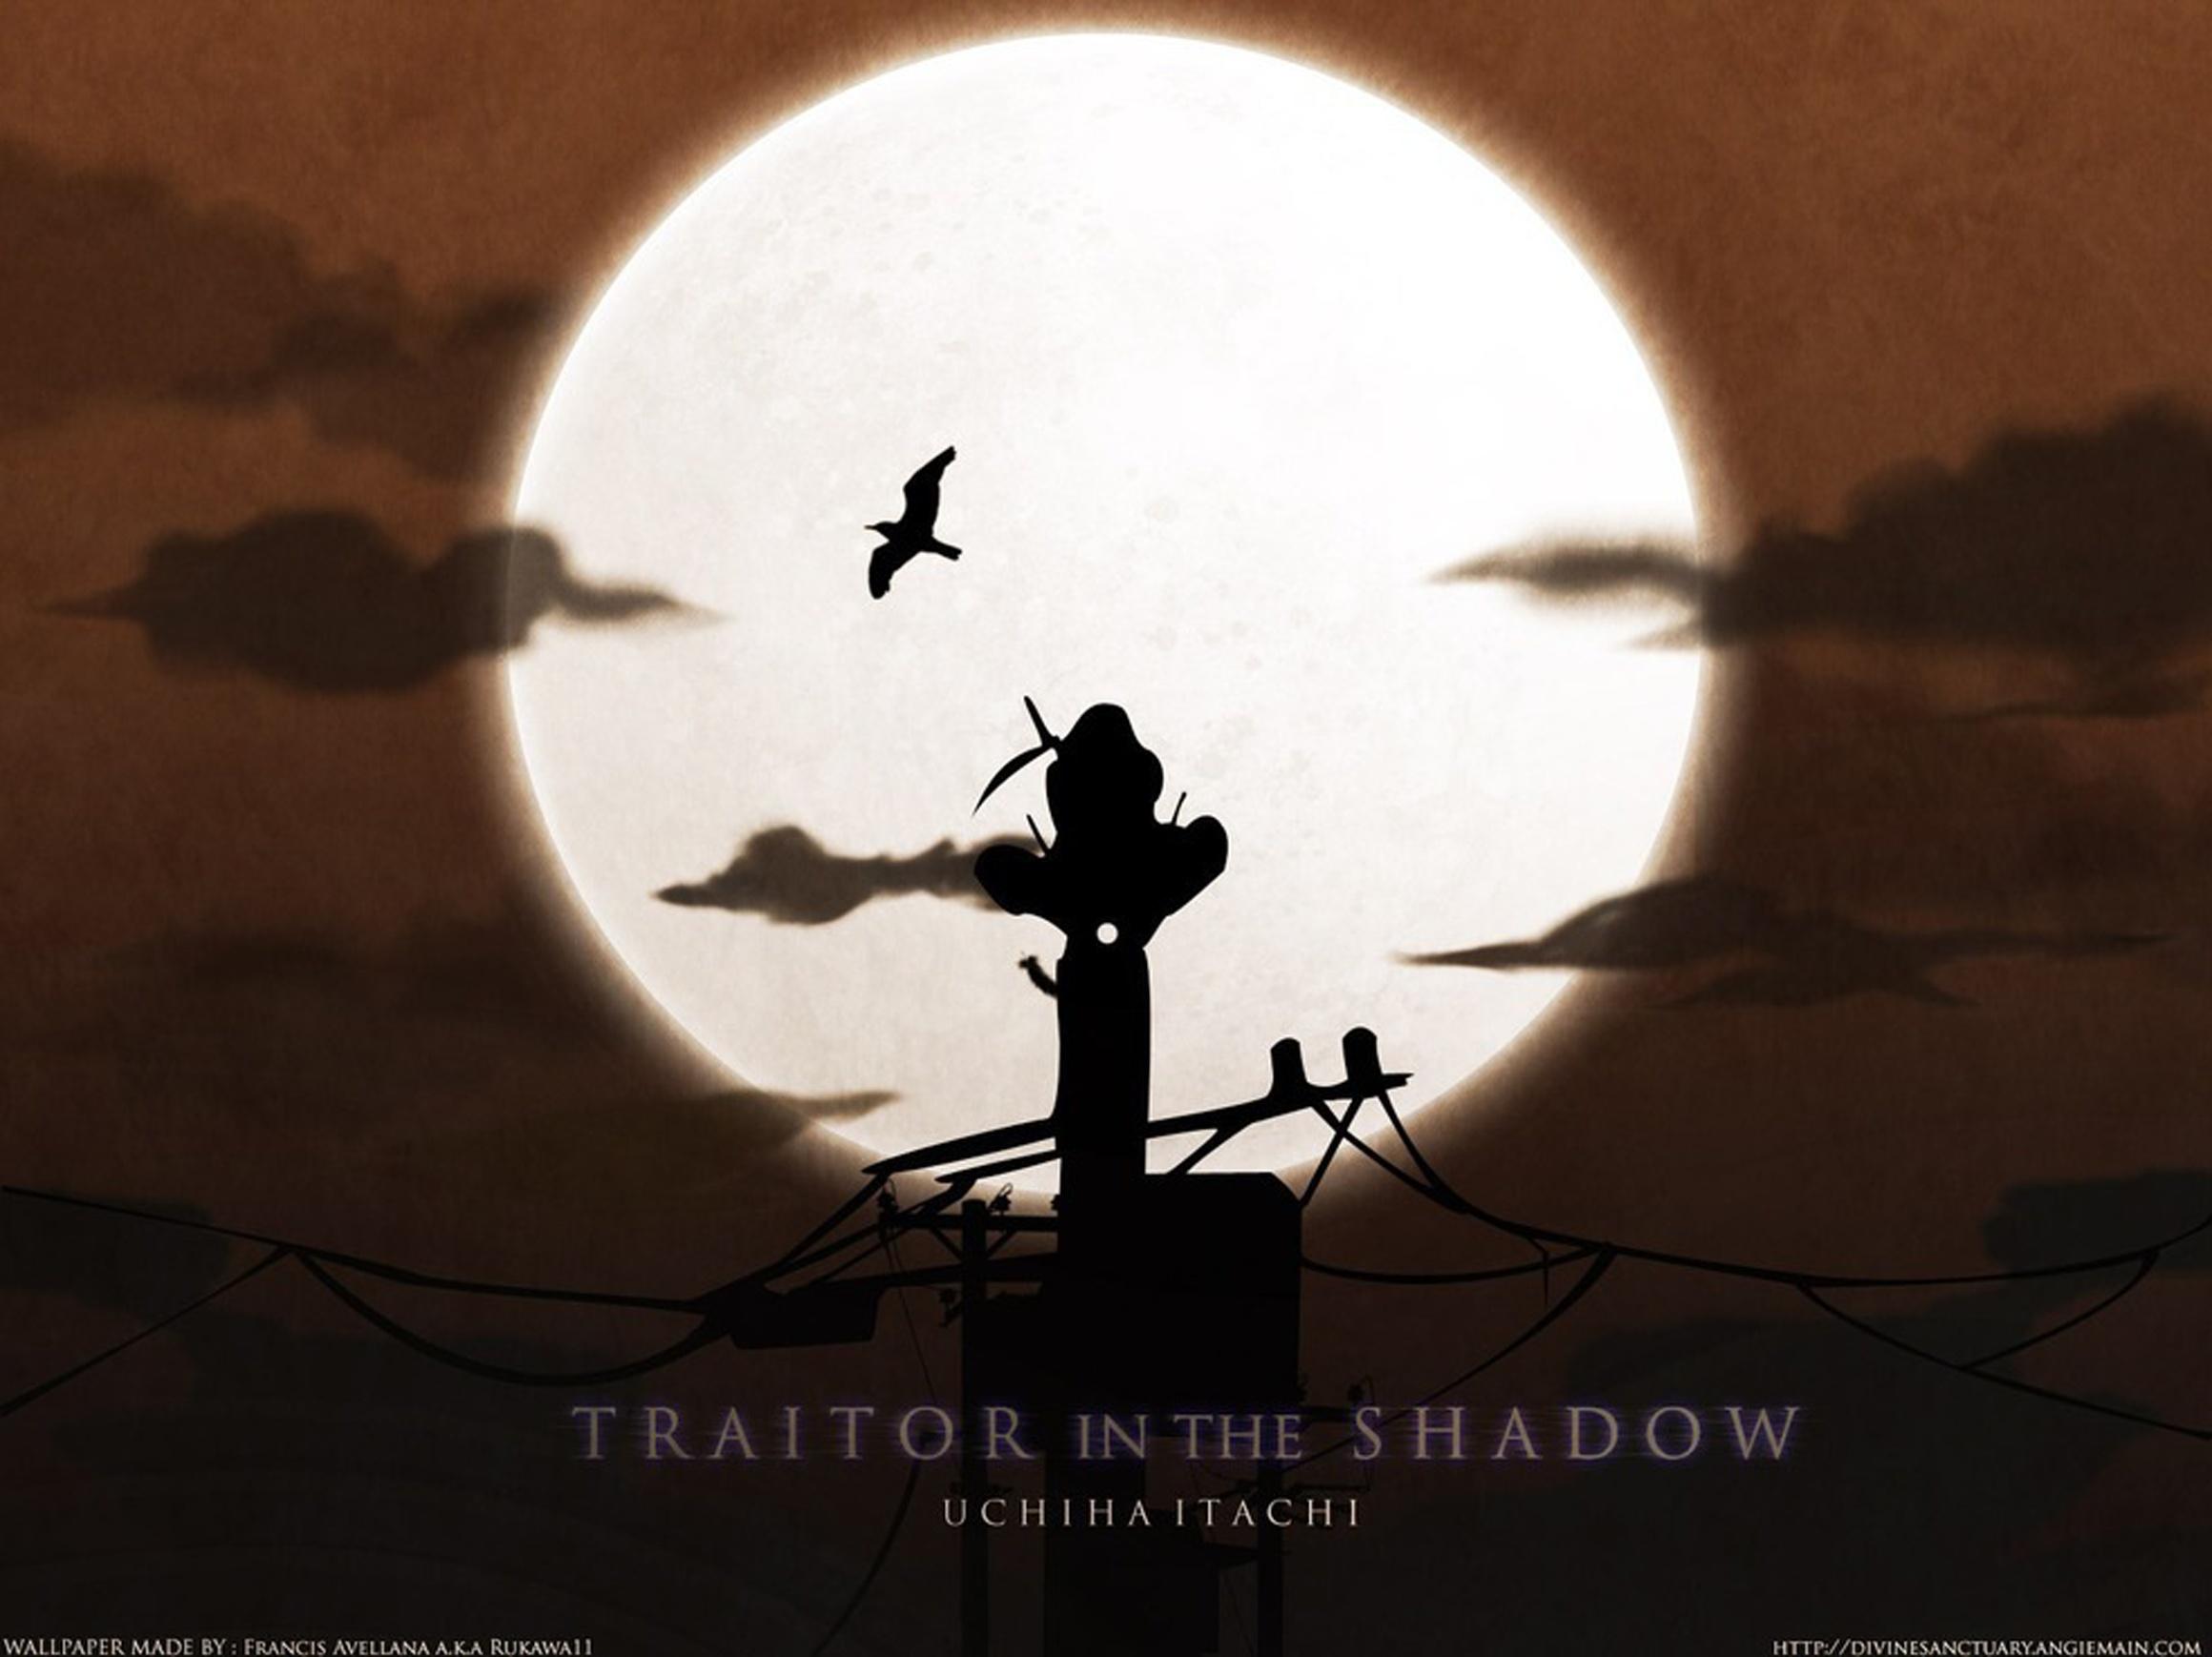 Amazing Wallpaper Naruto Silhouette - silhouettes_naruto_shippuden_ANBU-3baI  Image.jpg